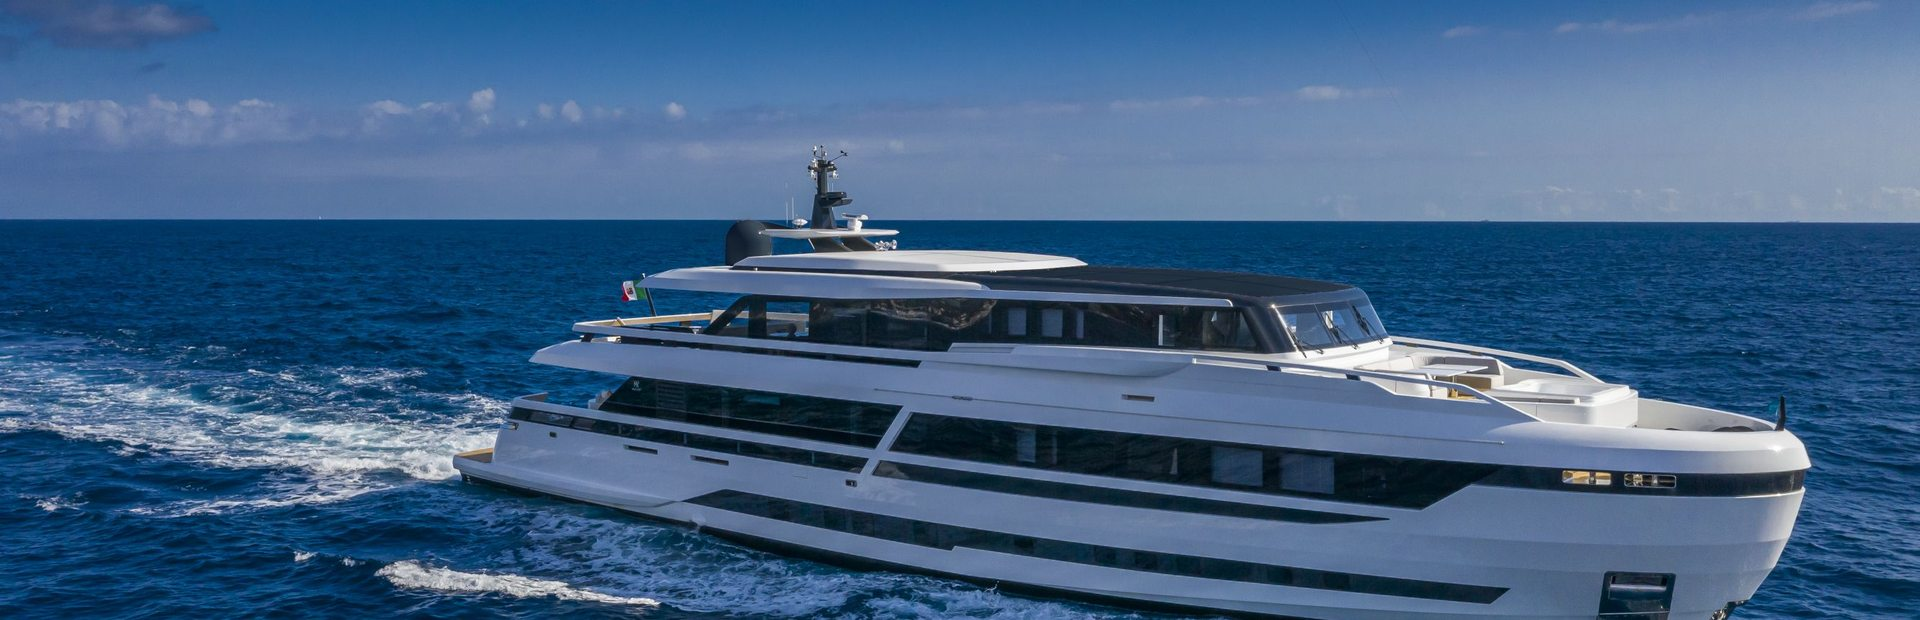 Extra 130 Alloy Yacht Charter